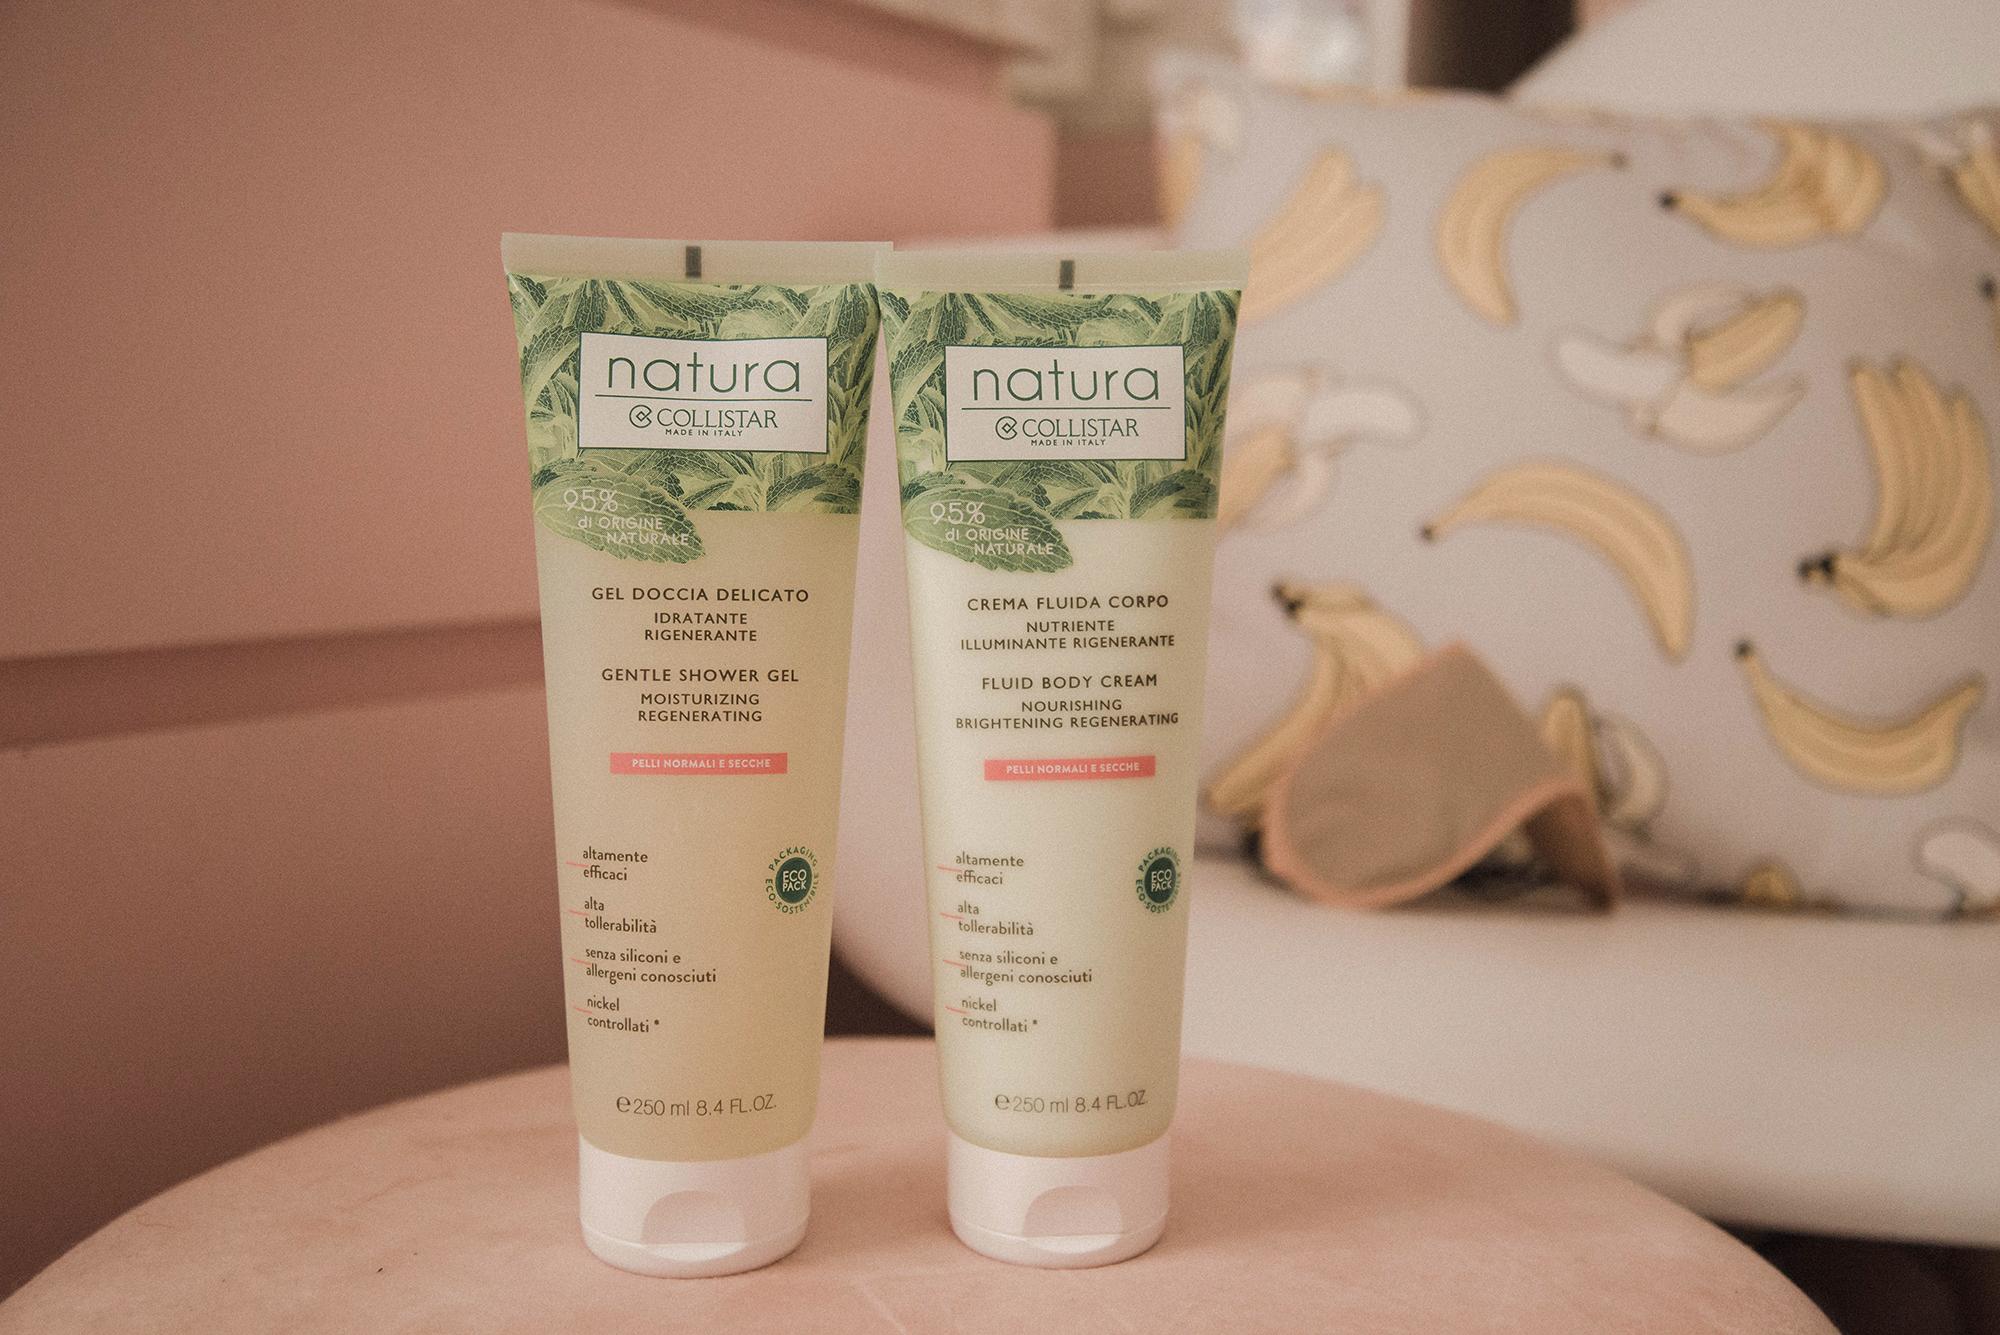 rituale skin care naturale